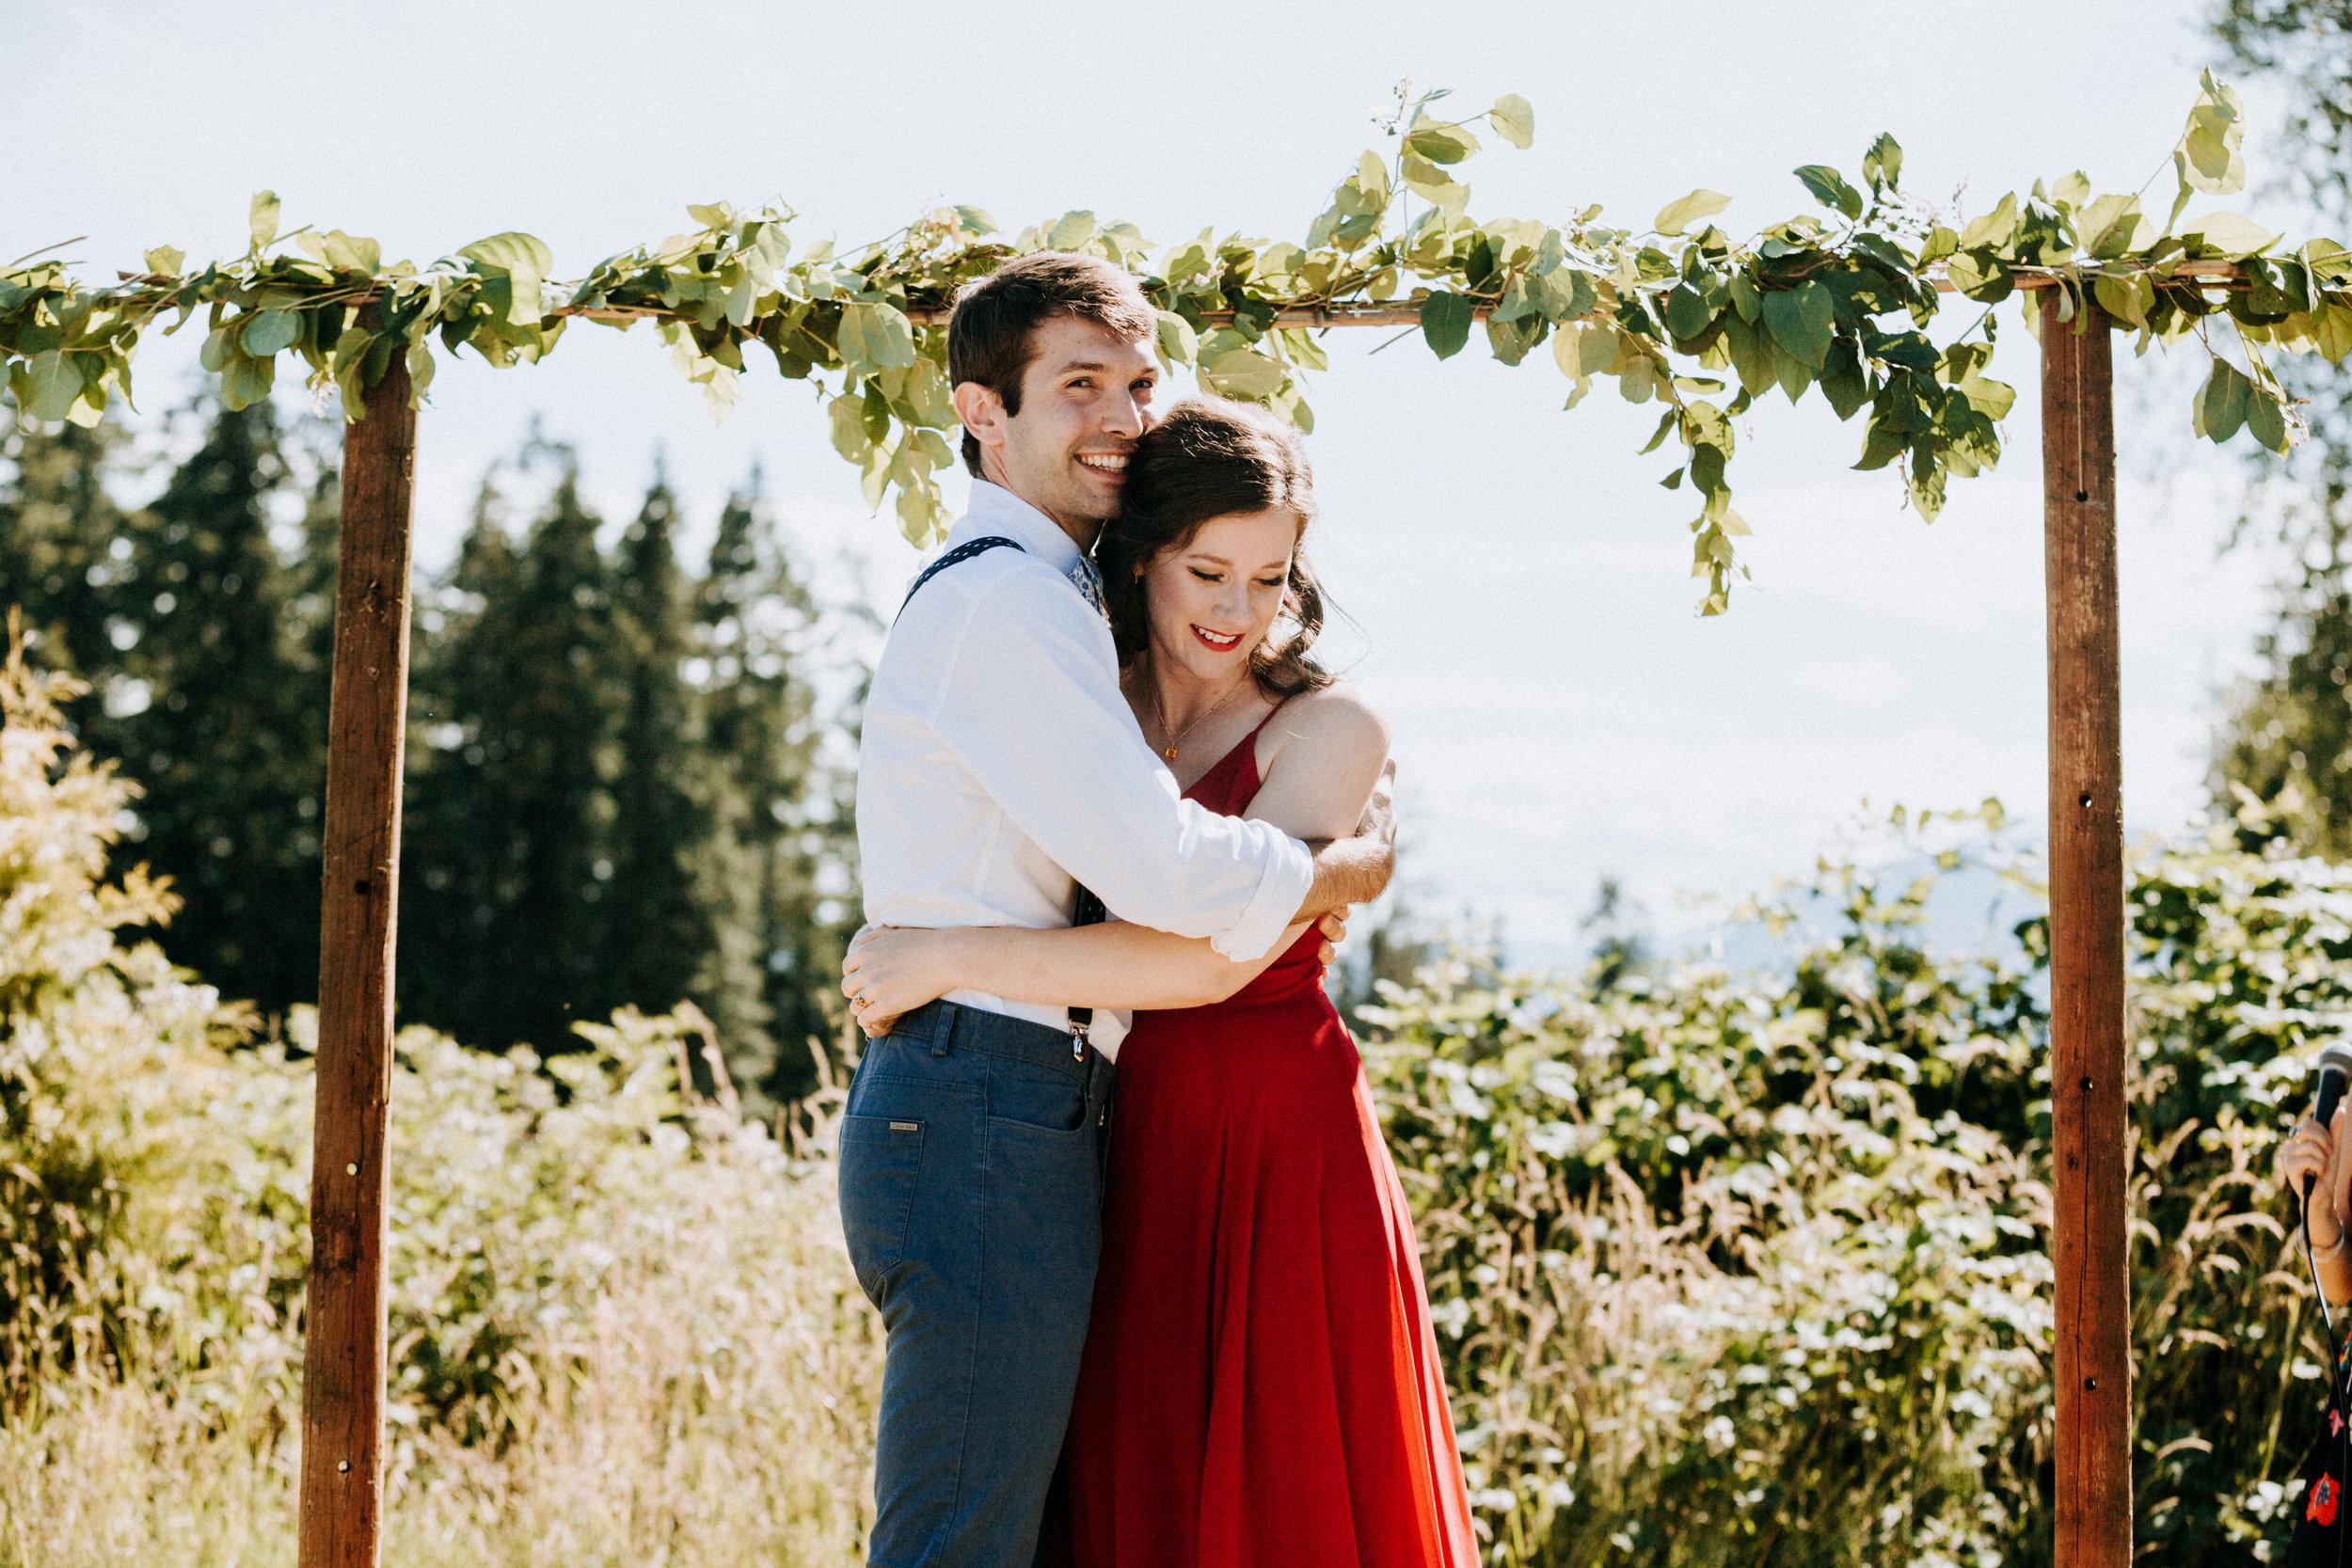 Bride and groom hug after ceremony Courtenay Wedding Photographer